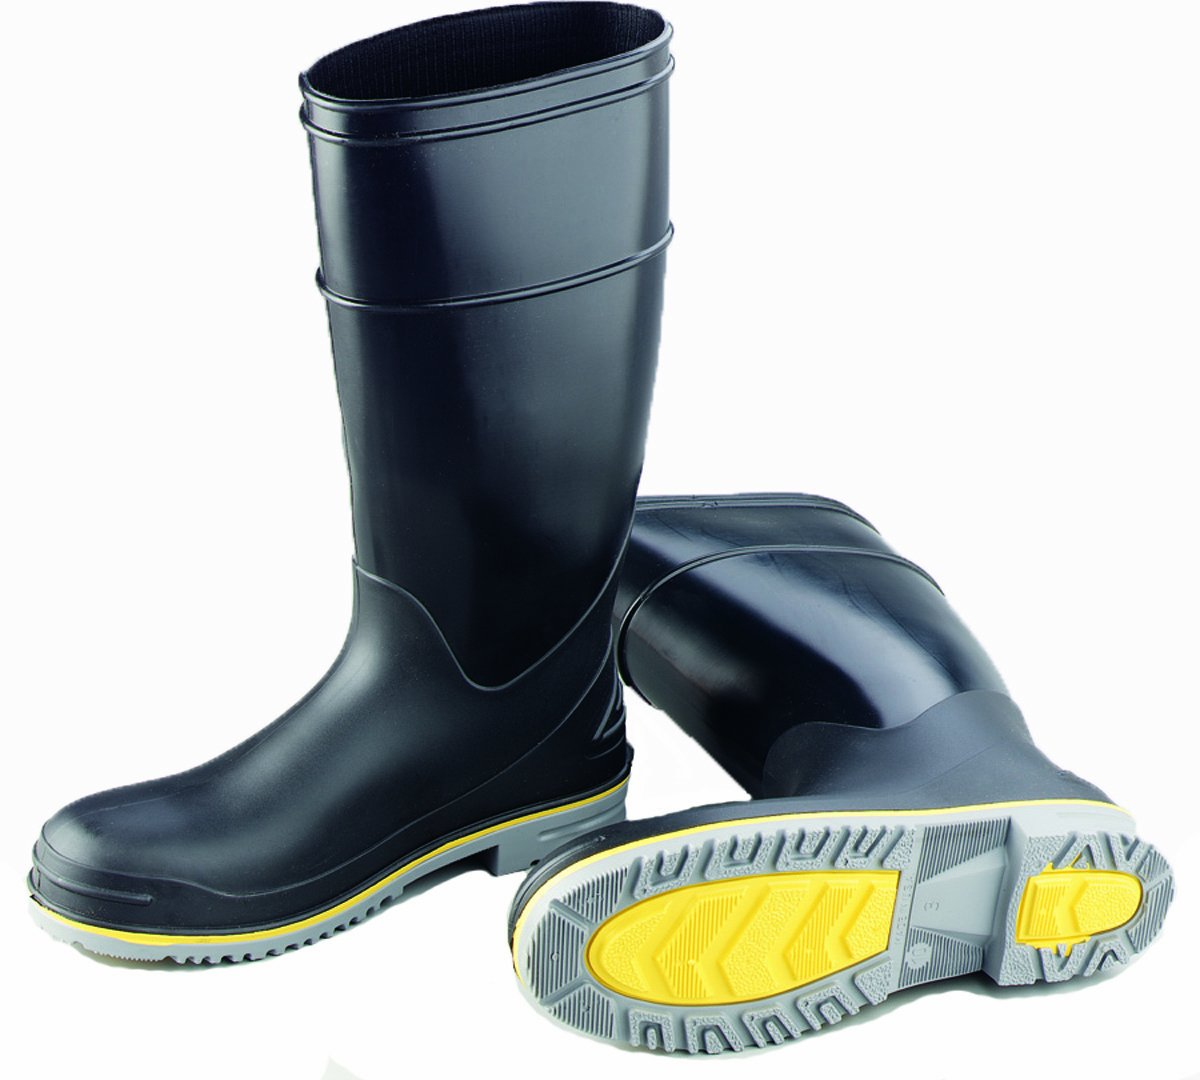 ONGUARD 89908 Polyblend PVC Flex 3 Men's Steel Toe KneeBoots with Power-Lug Outsole, 16